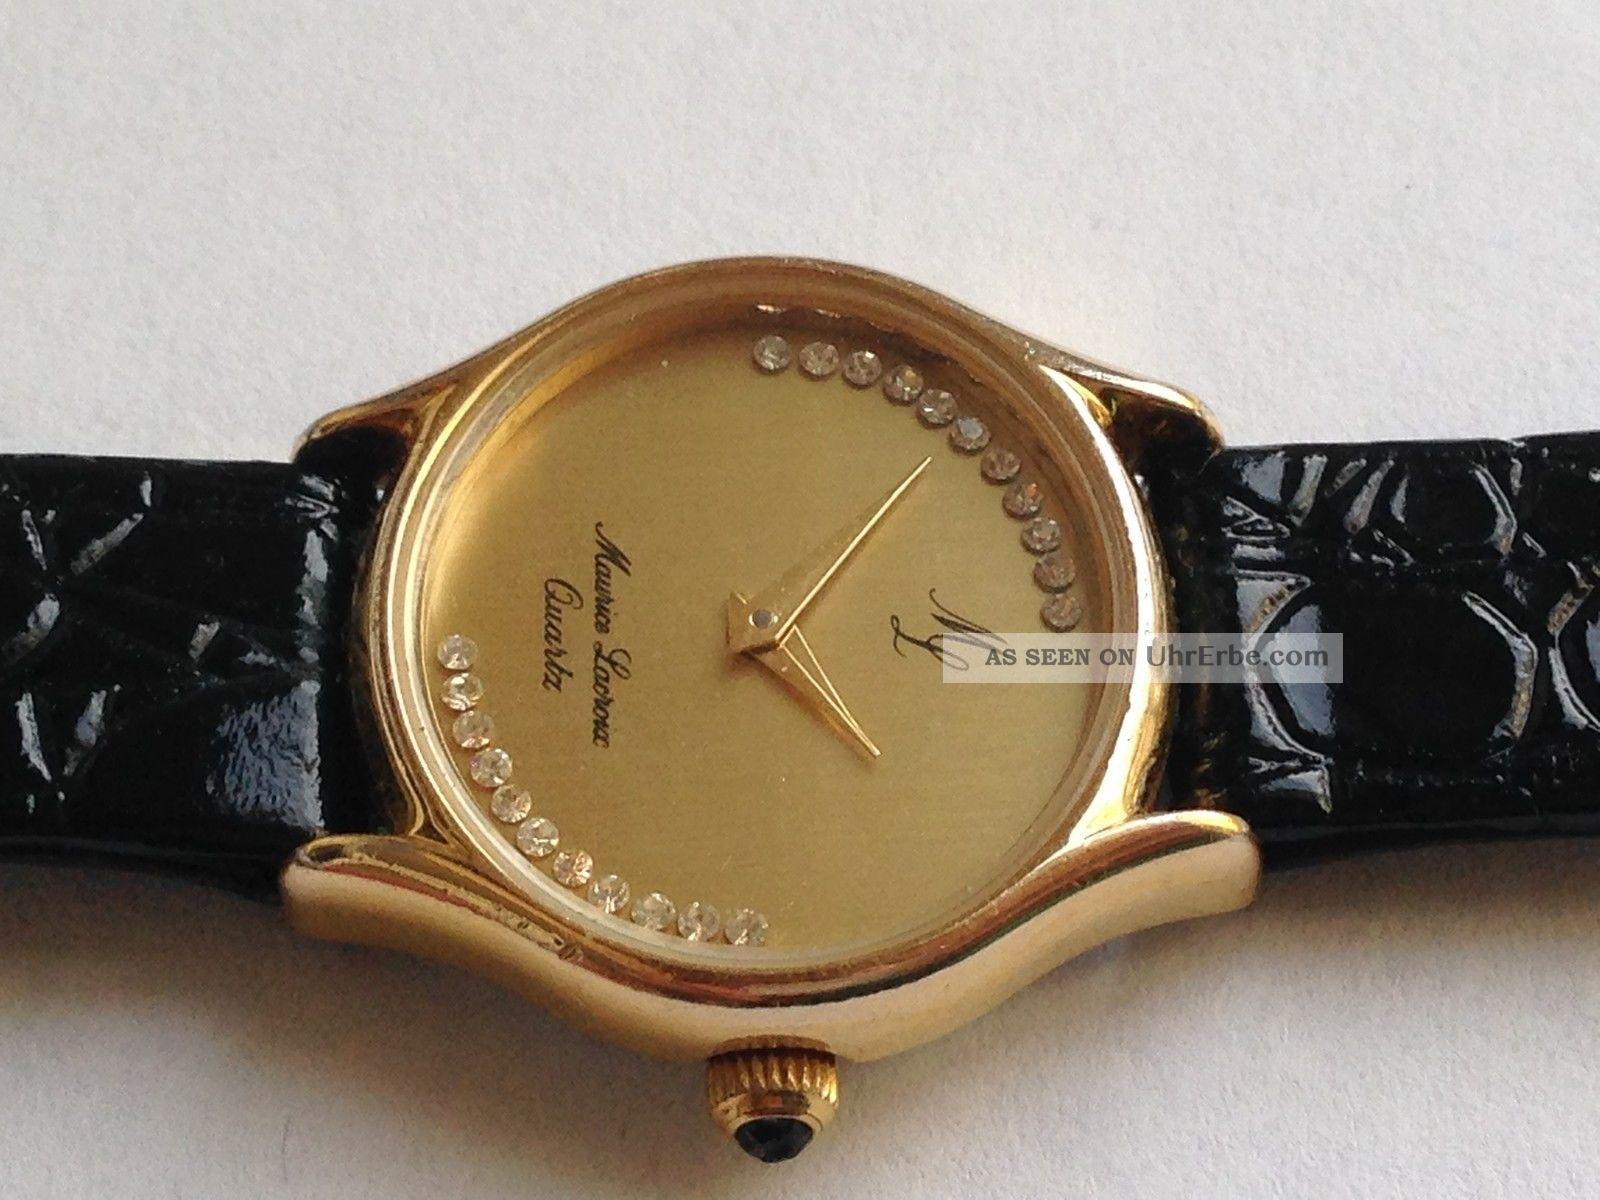 Schöne Orig.  Maurice Lacroix Damen Quartz Uhr Armbanduhr. Armbanduhren Bild